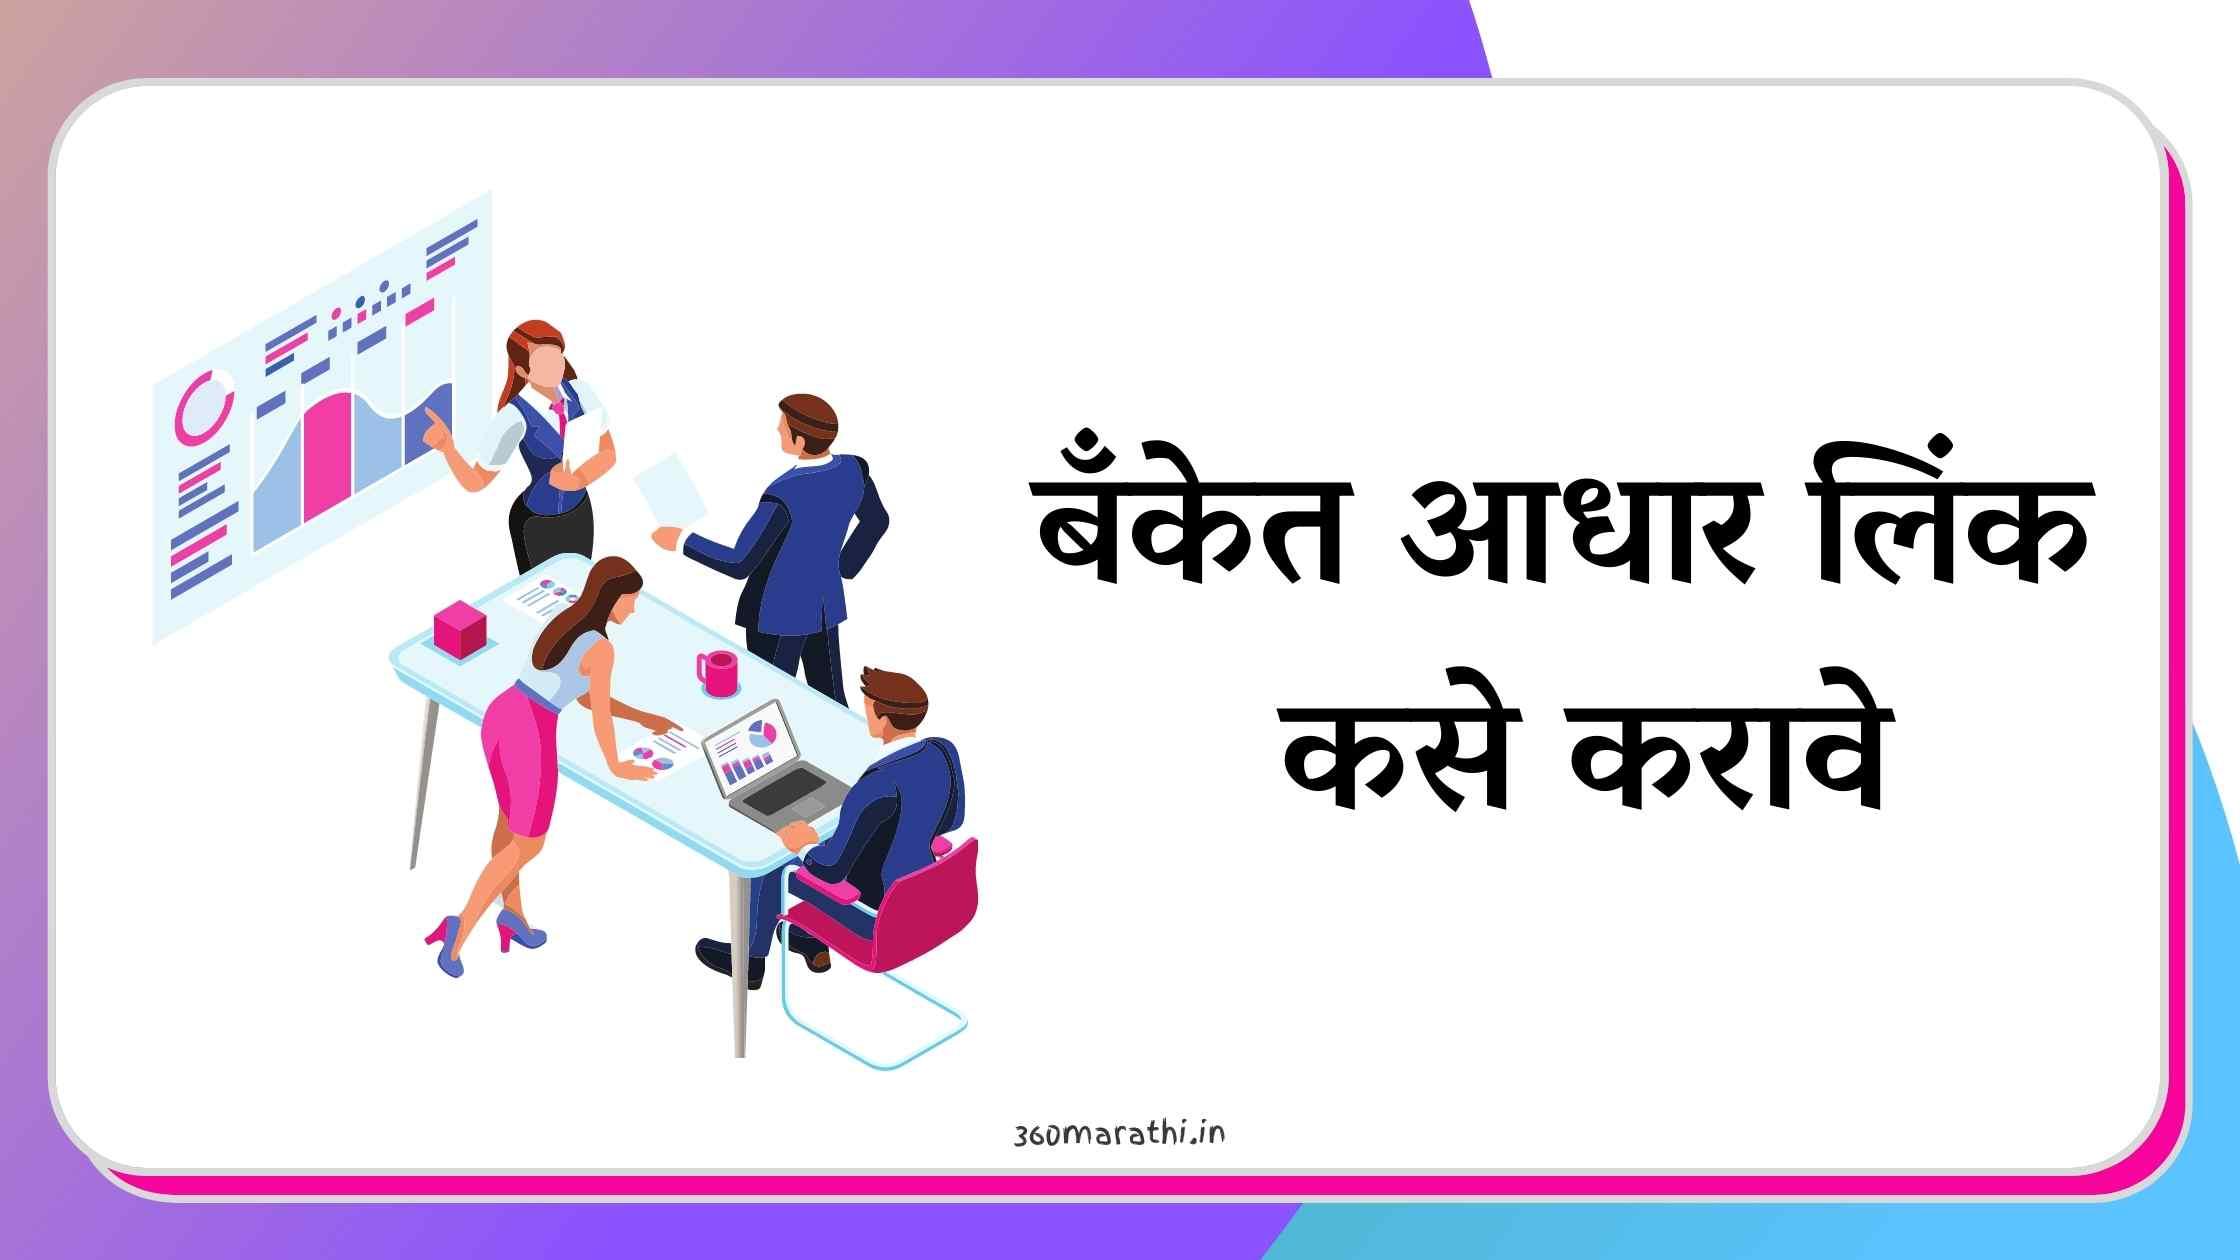 बँकेत आधार लिंक कसे करावे   Aadhar Card Link to Bank Account in Marathi